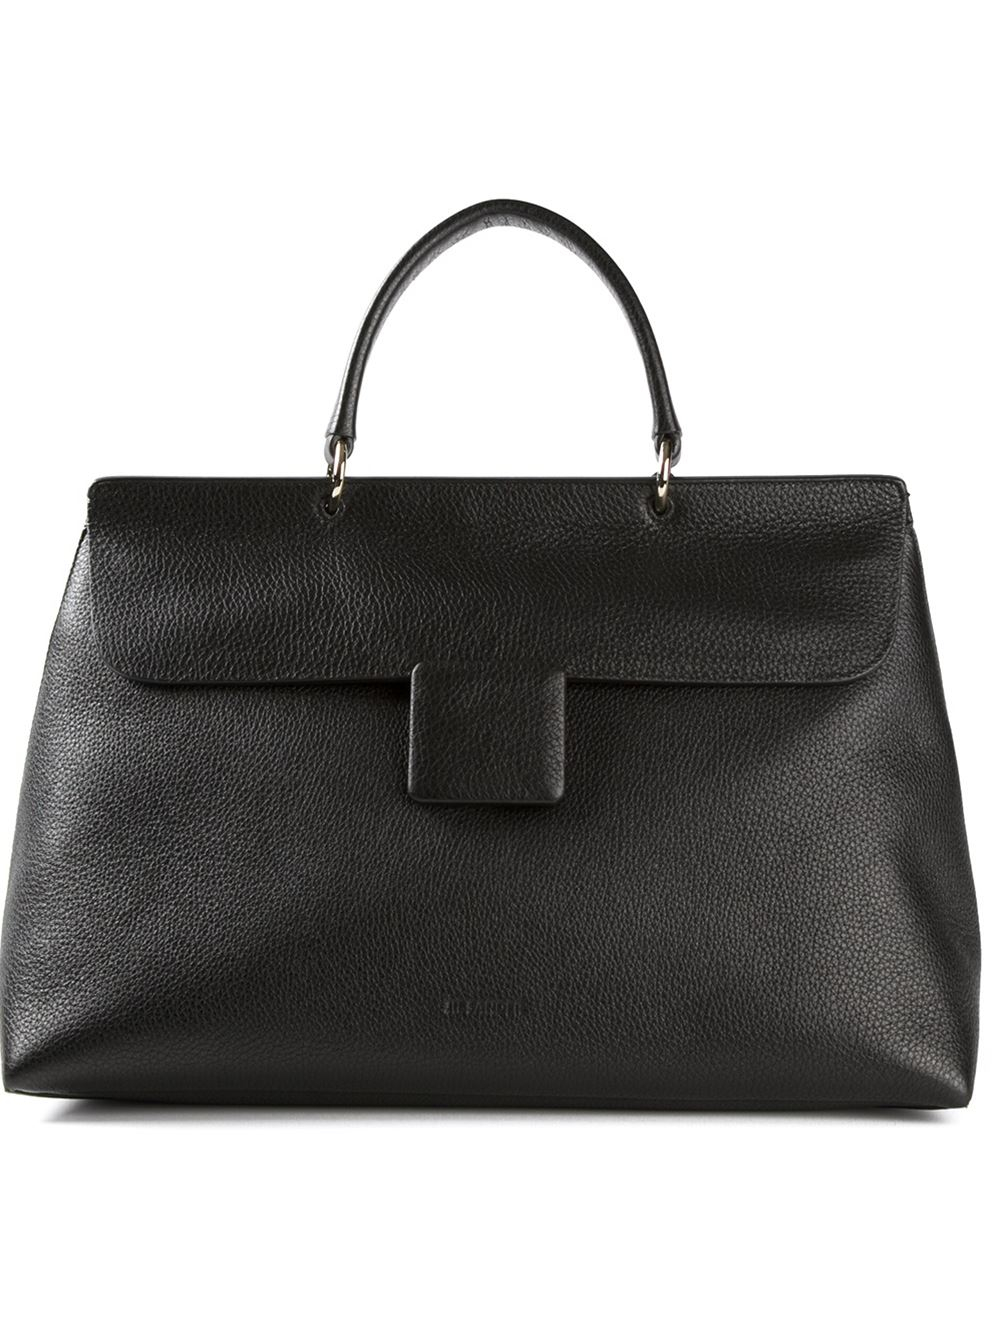 Lyst Jil Sander Large Lady J Tote Bag In Black